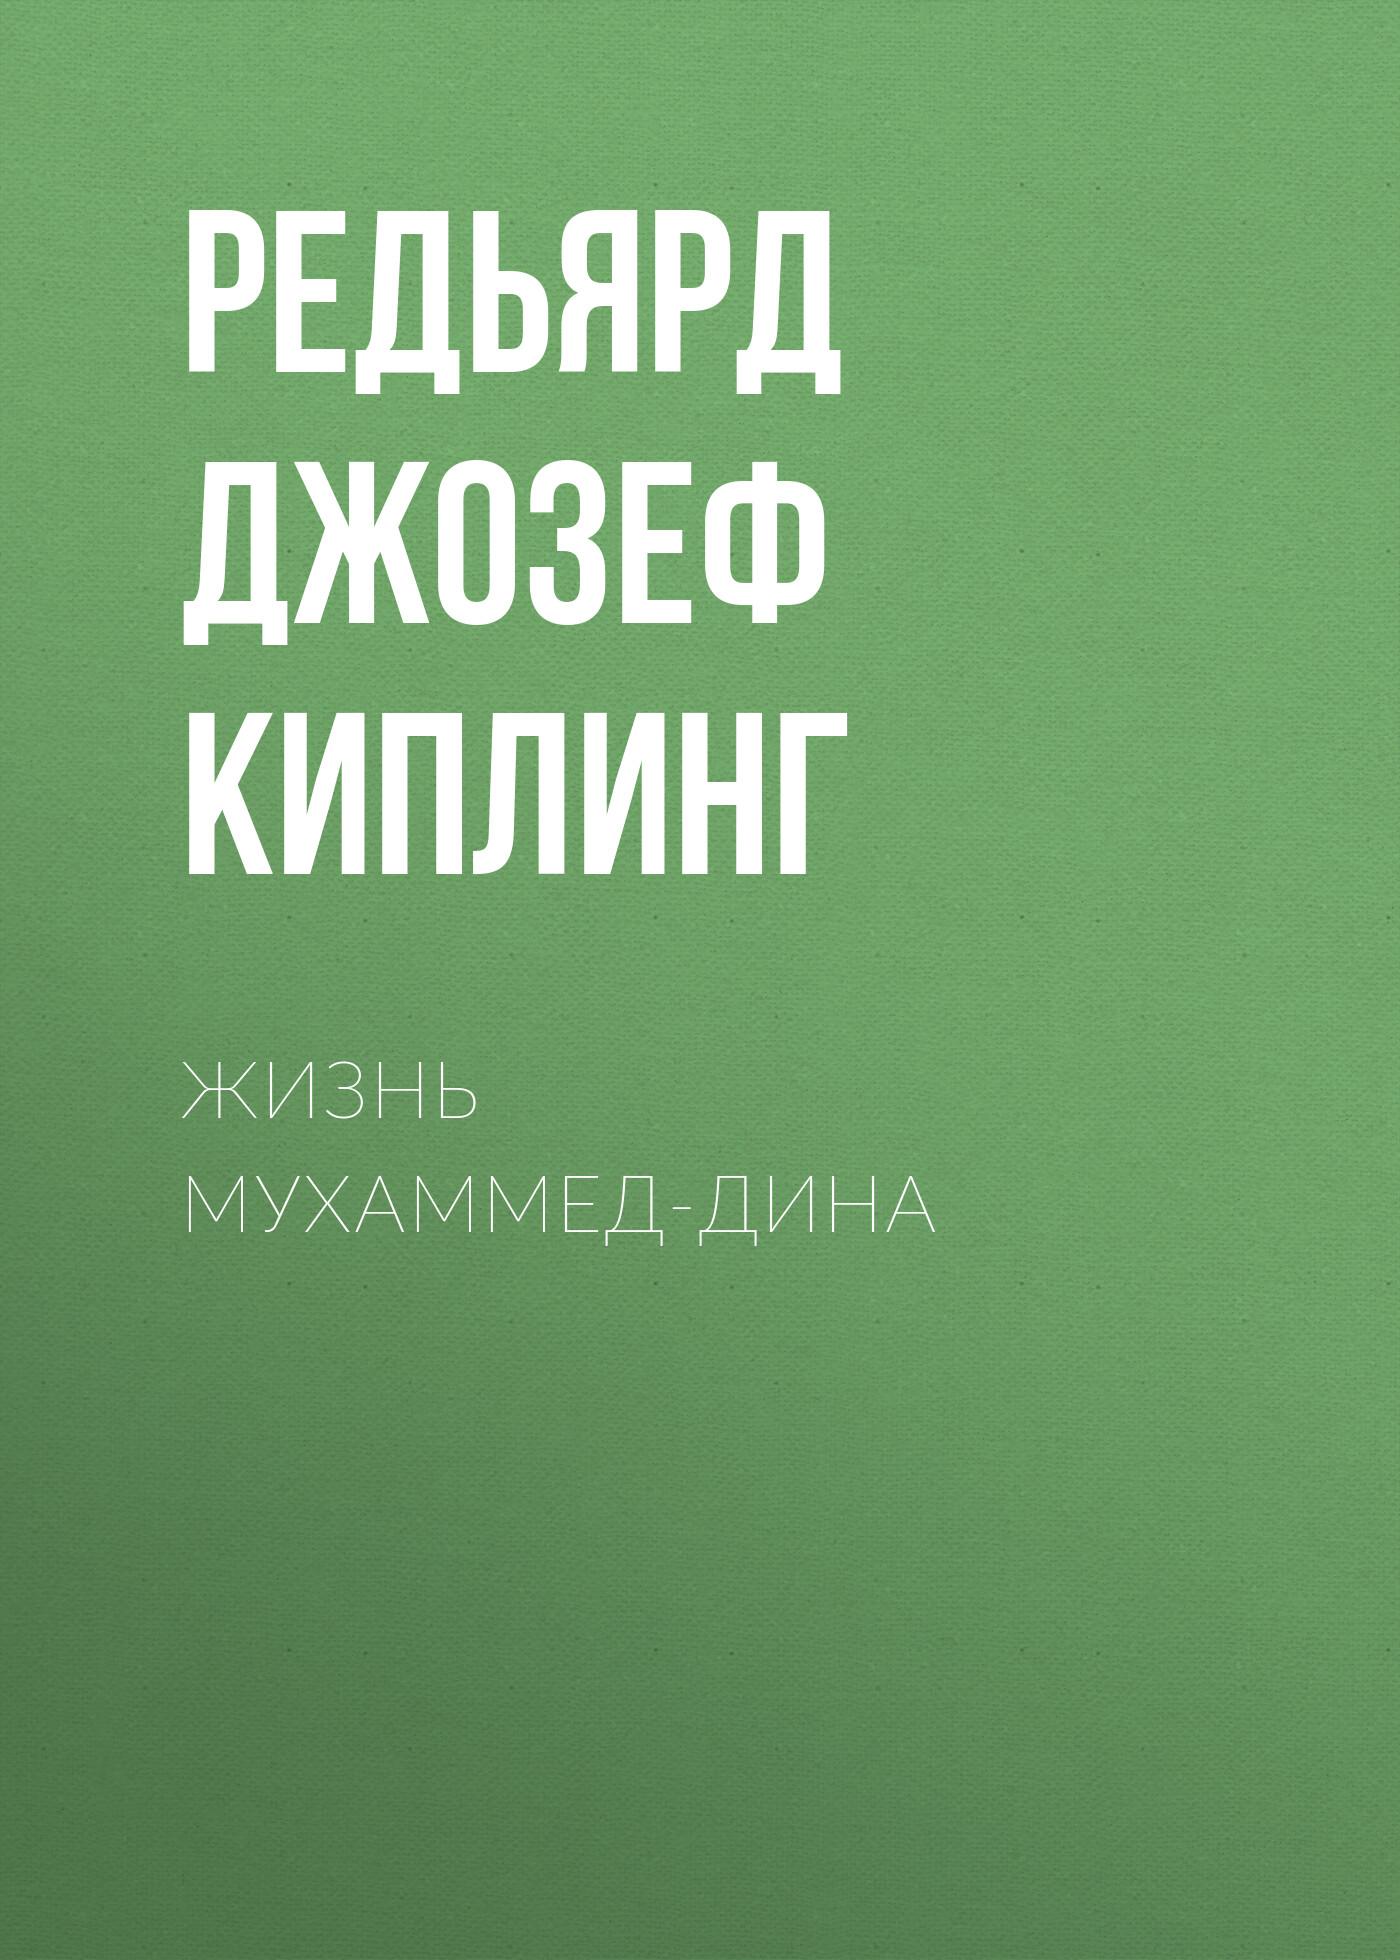 Редьярд Киплинг «Жизнь Мухаммед-Дина»